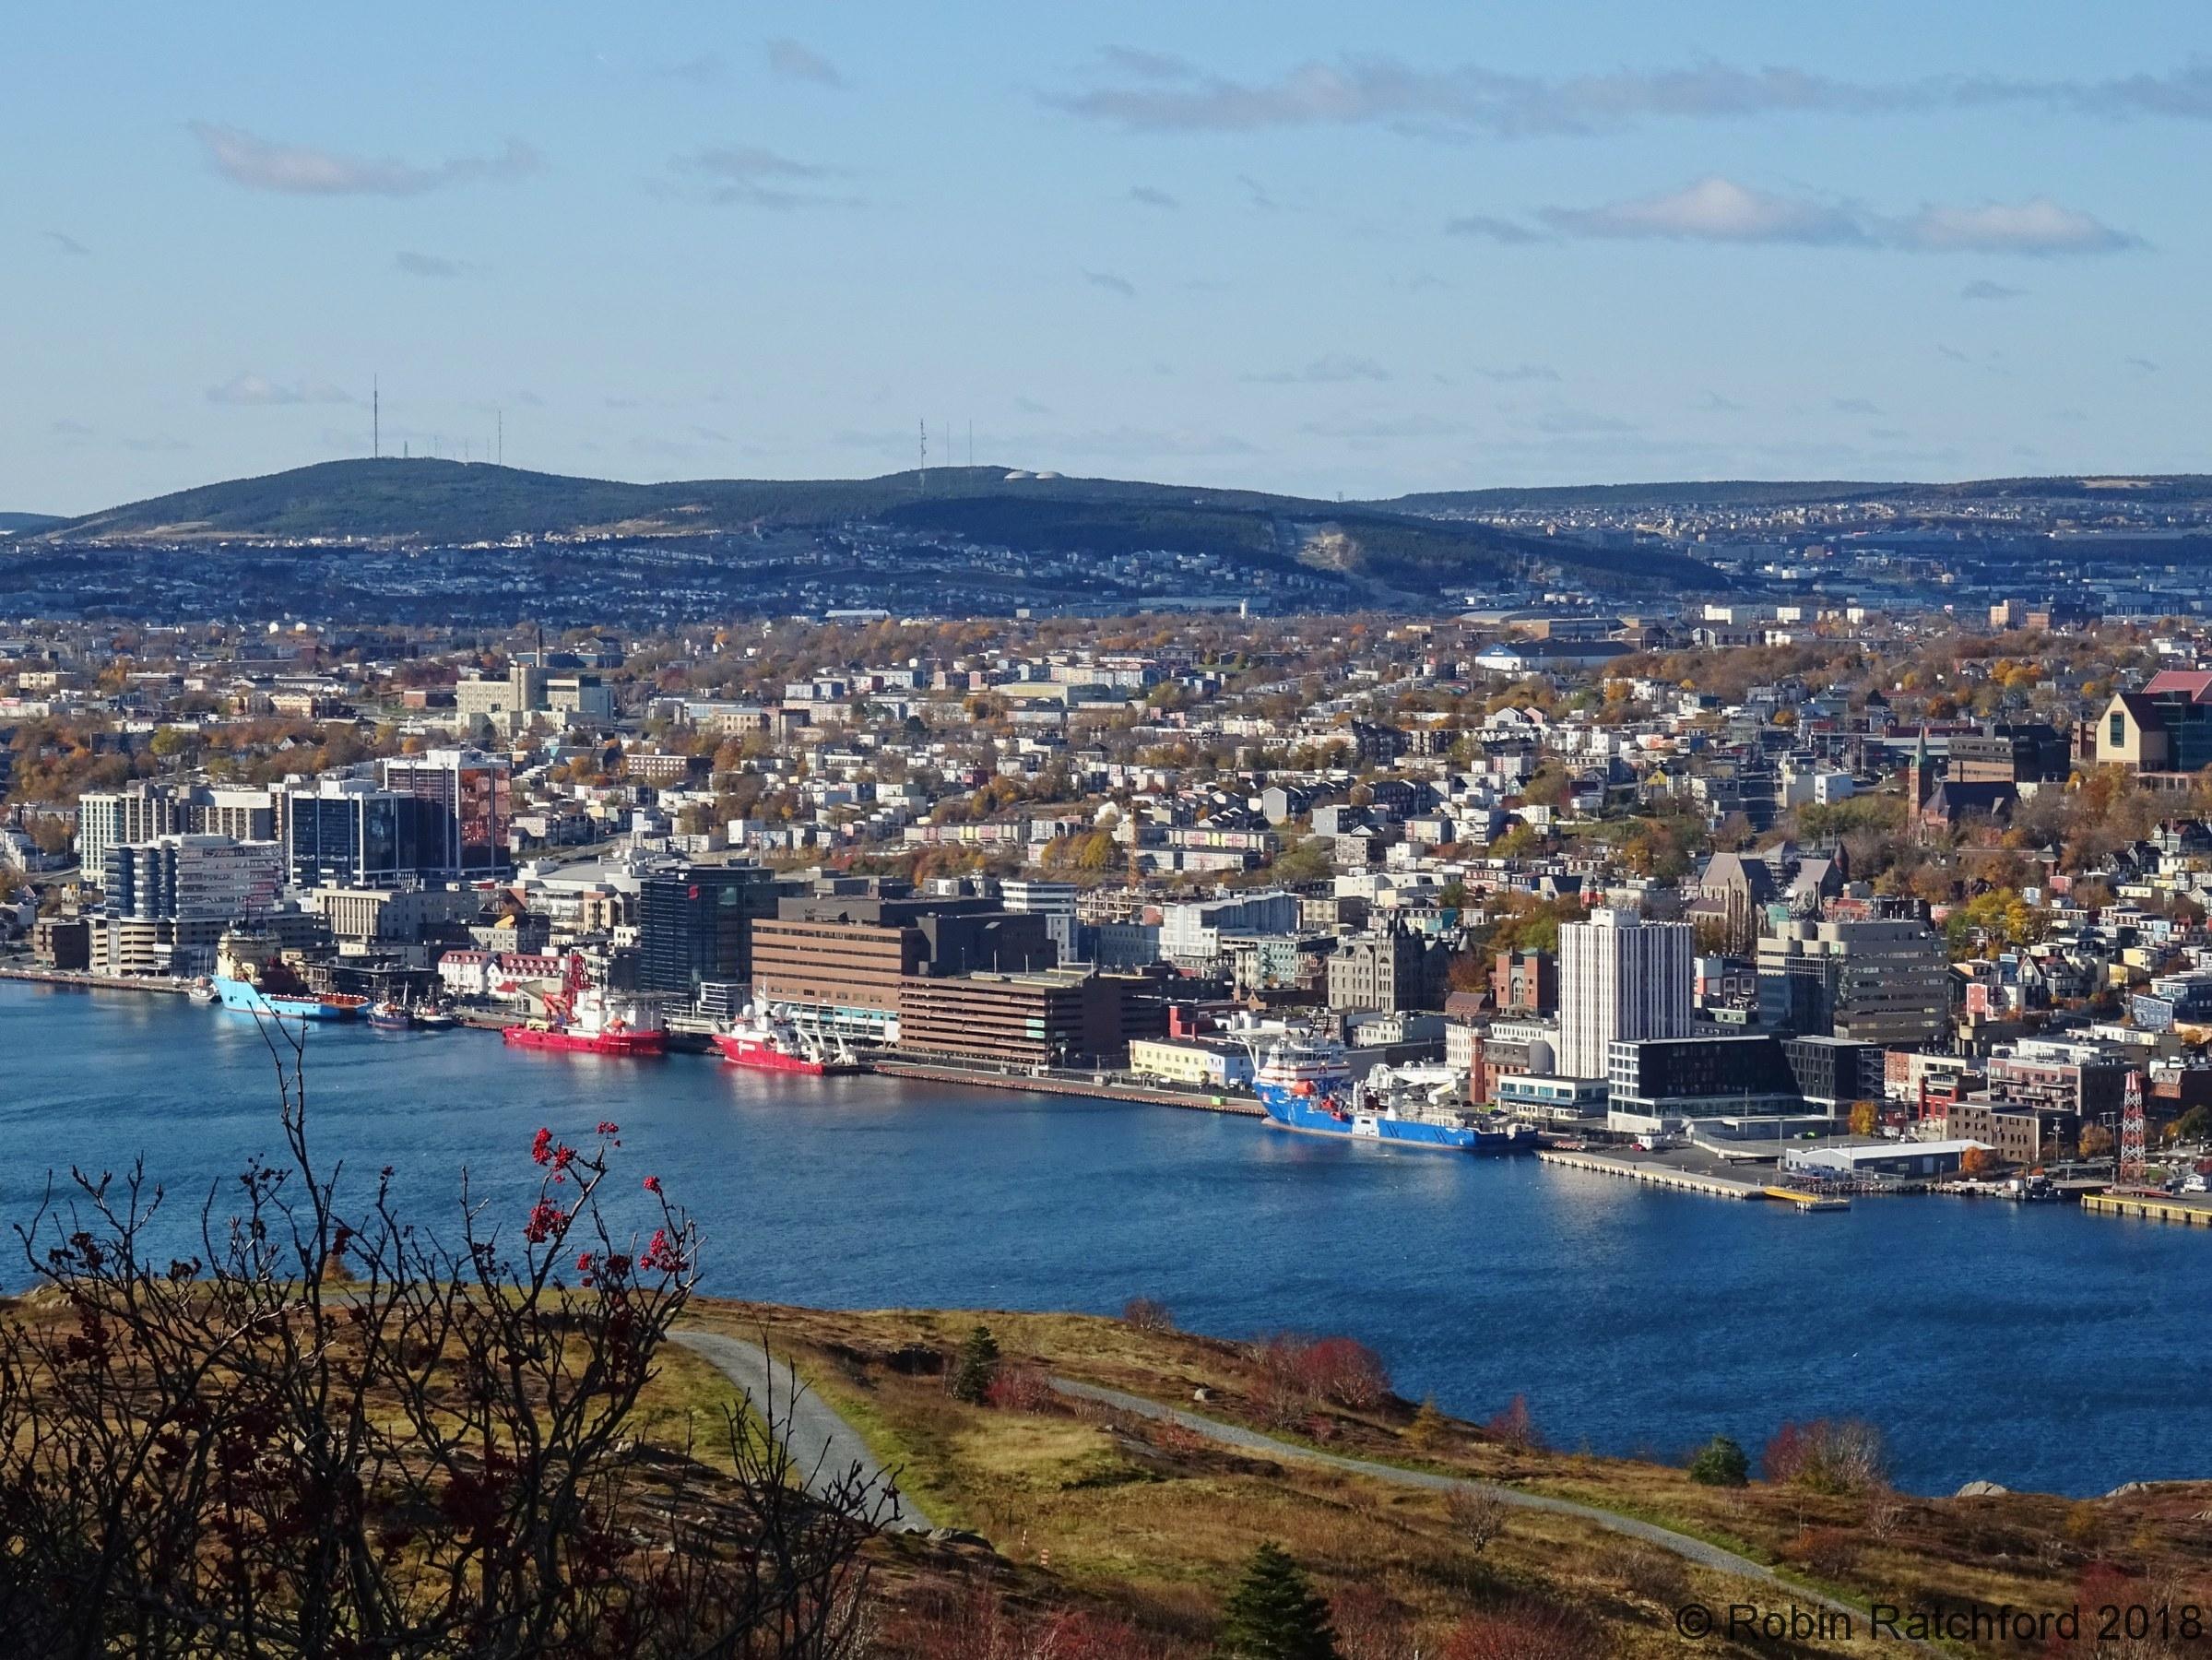 View of St John's